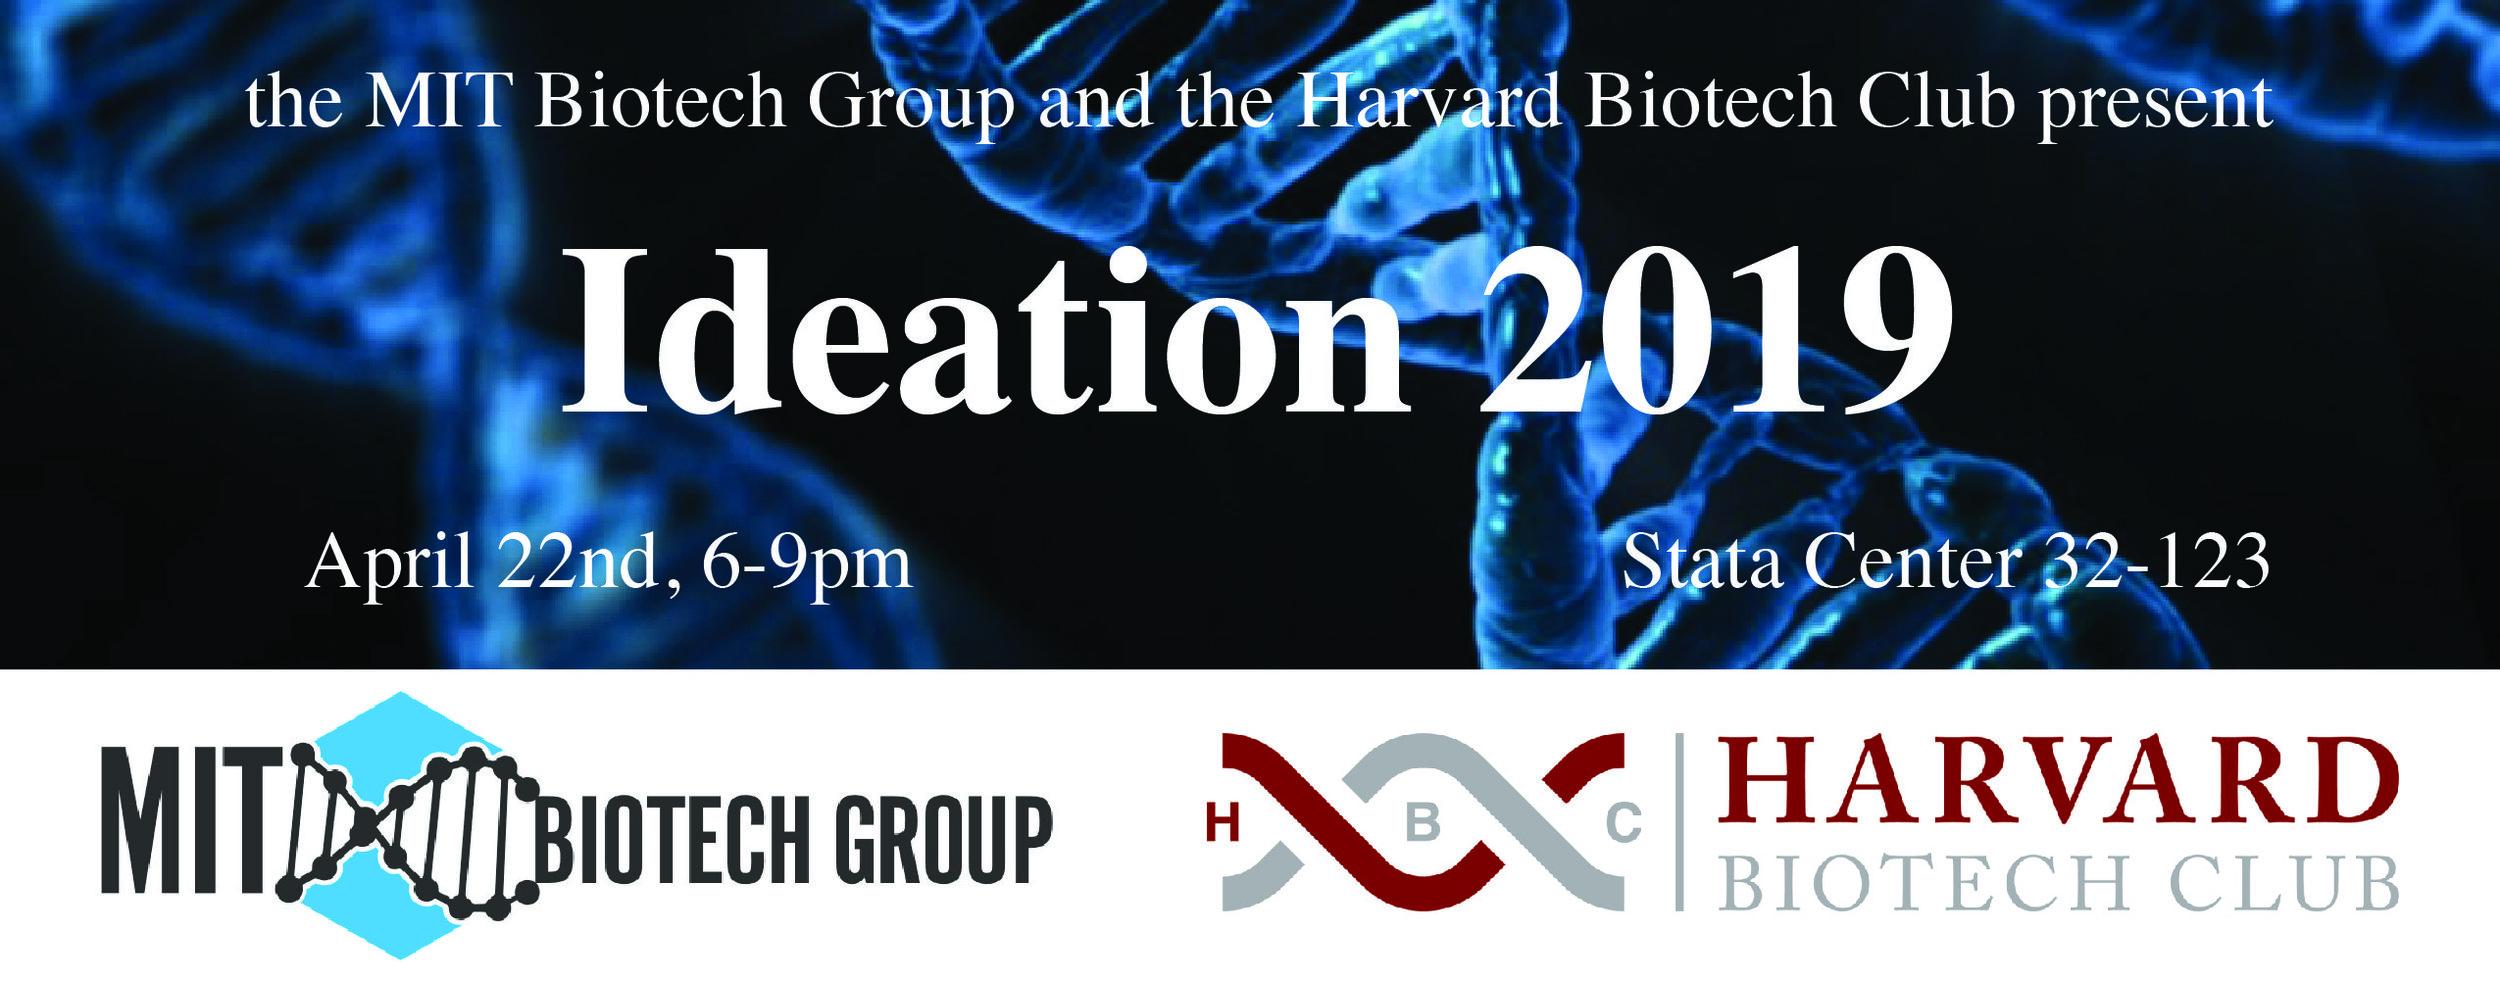 Ideation 2019 pub-01.jpg